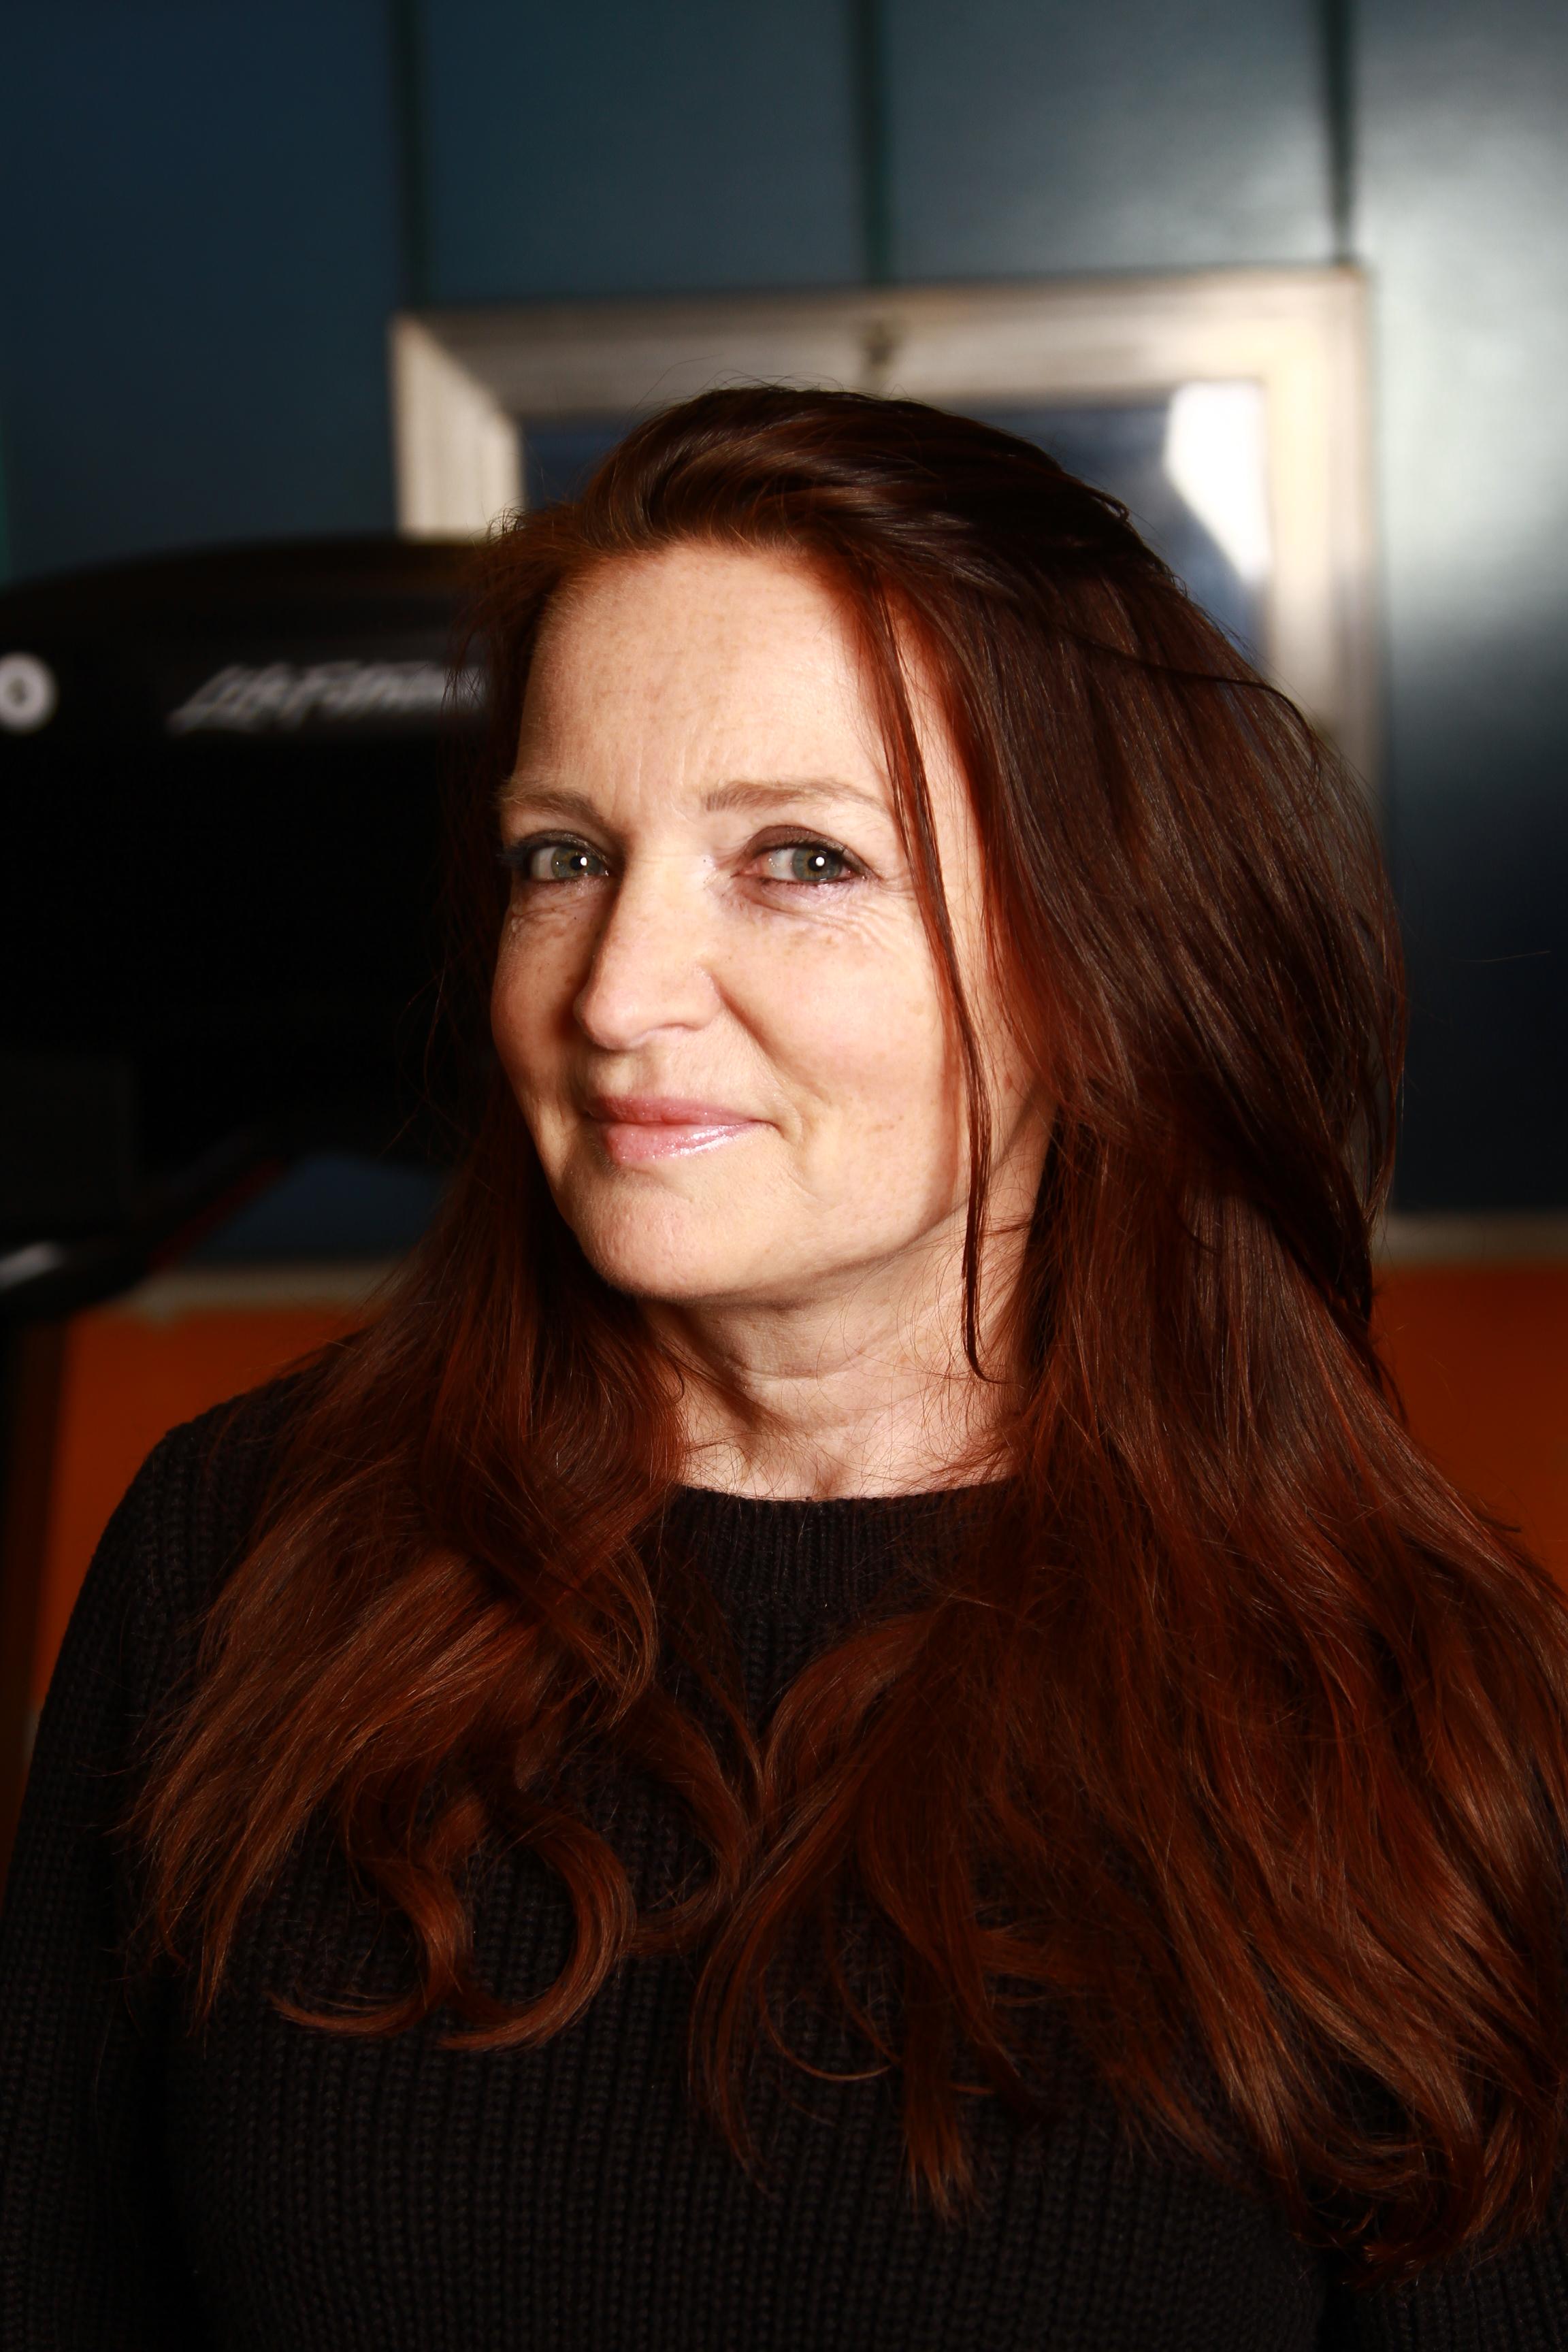 Karin Stocker-Keilbach